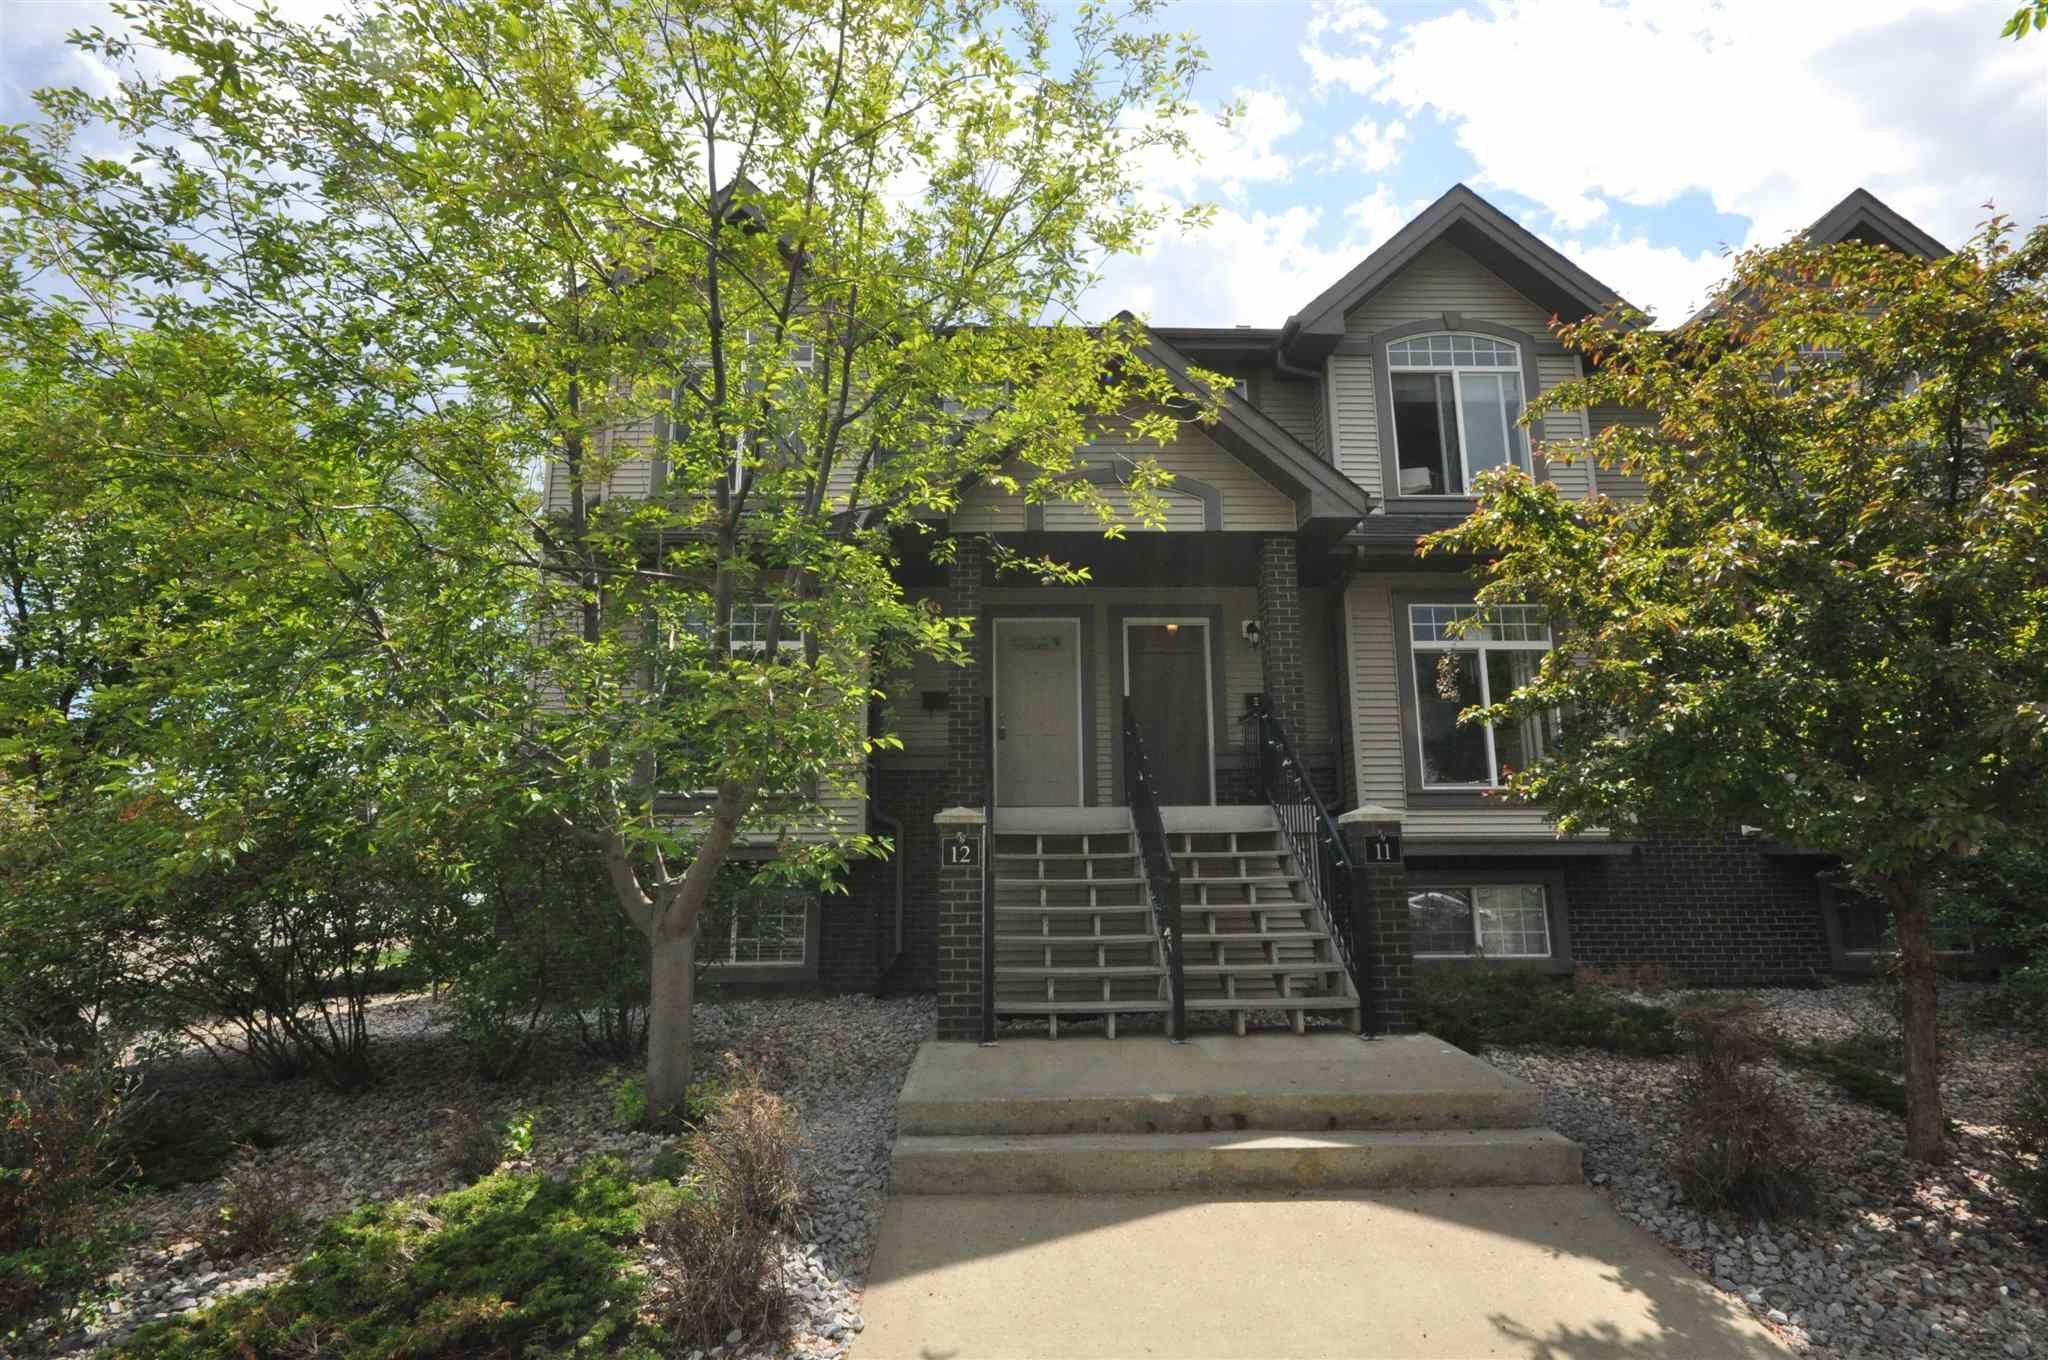 Main Photo: 12 4731 TERWILLEGAR Common in Edmonton: Zone 14 Townhouse for sale : MLS®# E4248559